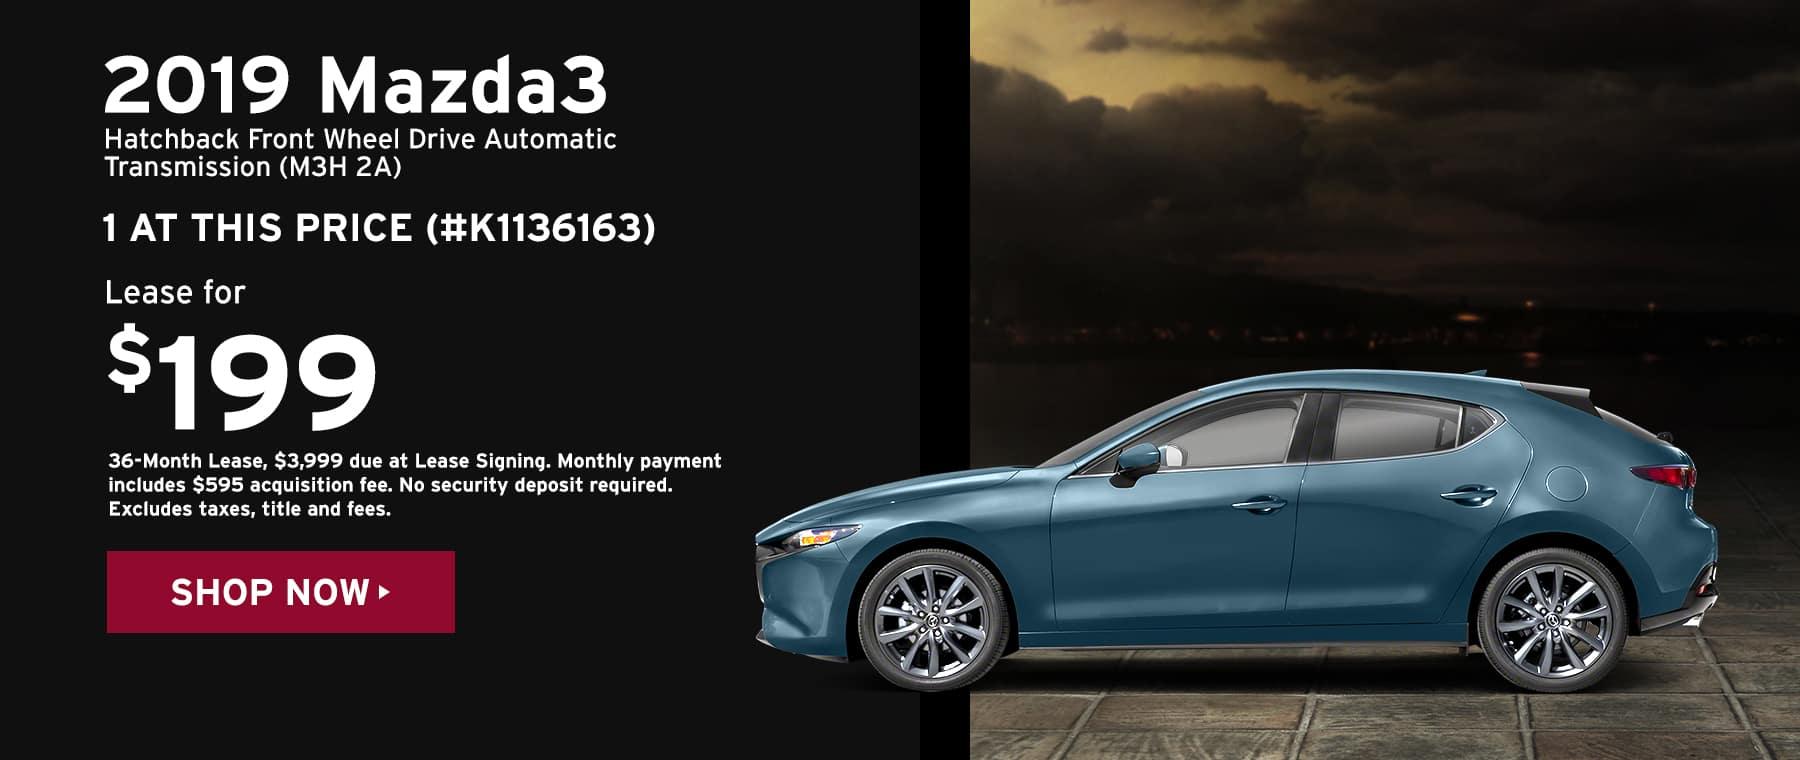 2019 Mazda3 Hatchback